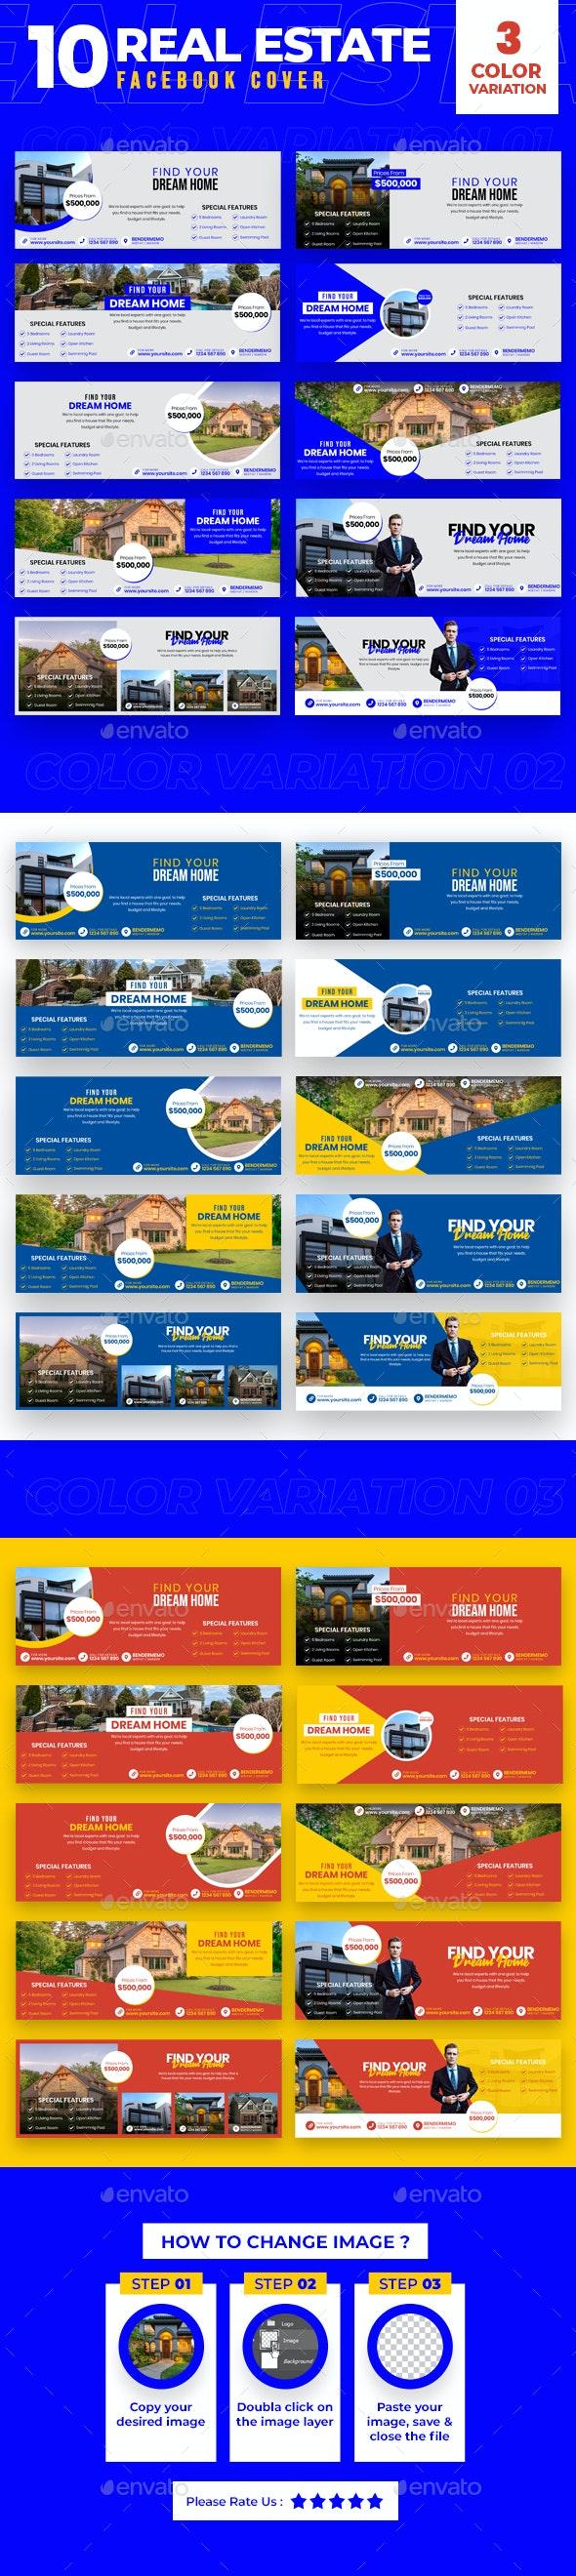 Real Estate 10 Facebook Cover - Facebook Timeline Covers Social Media